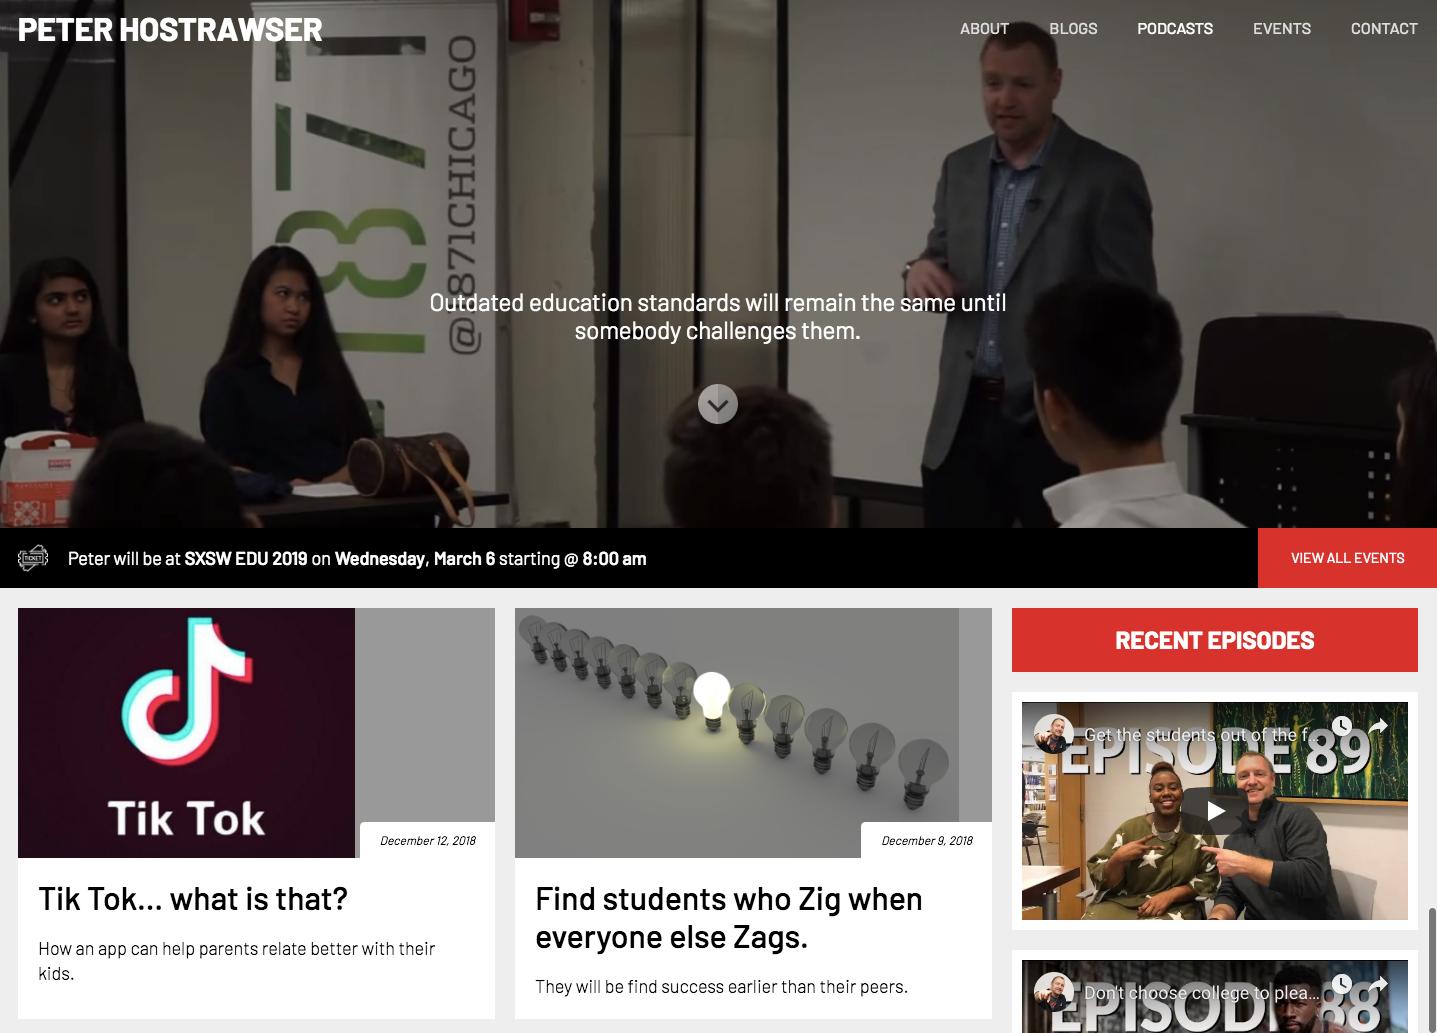 Peter Hostrawser homepage